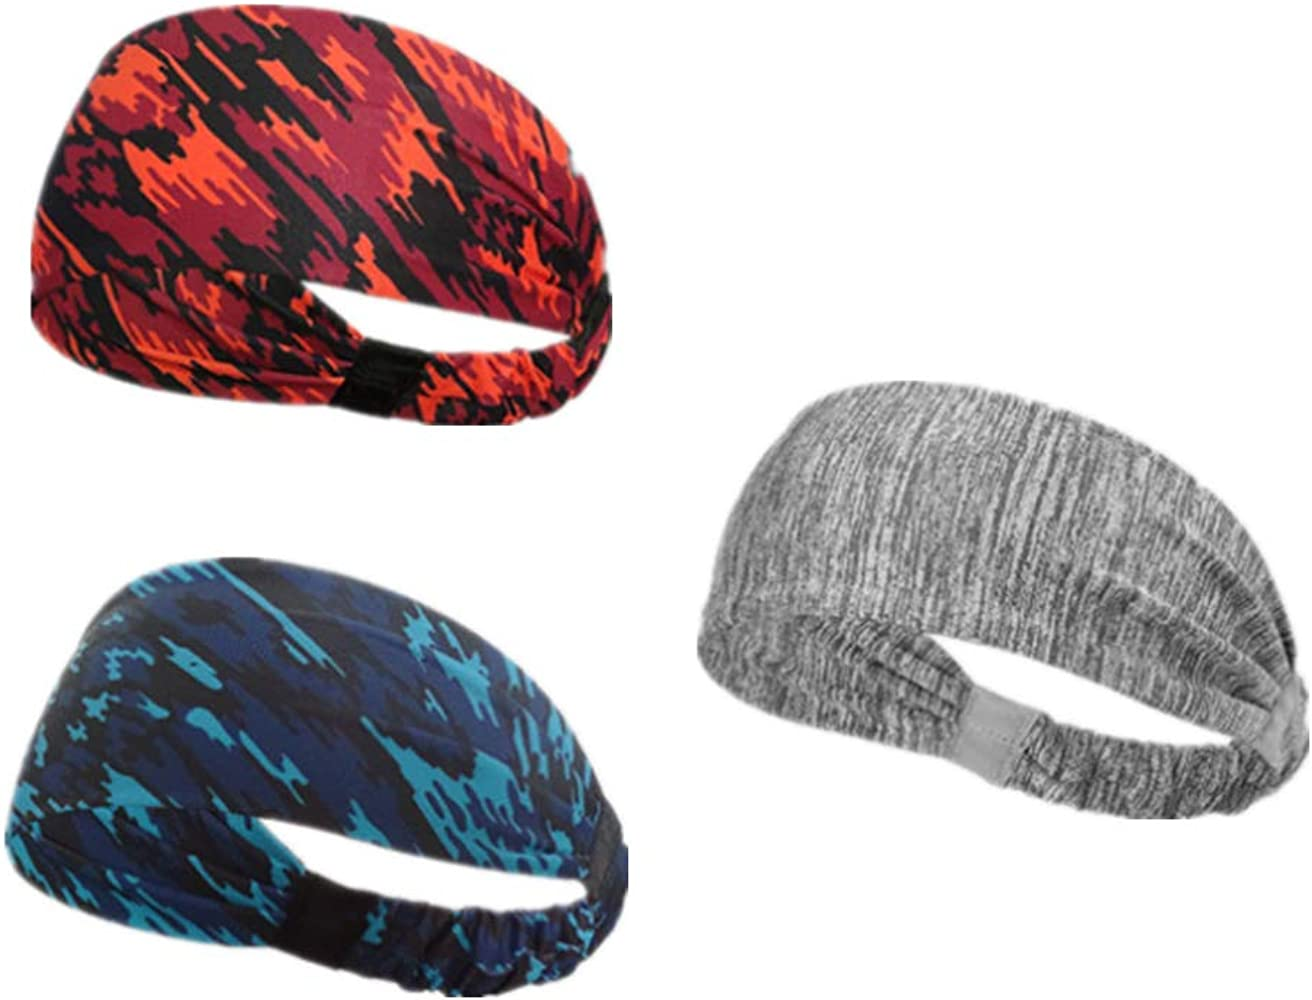 Sports Running Jogging Yoga Gym Fitness Sweat Sweatband Headband Hair Band S